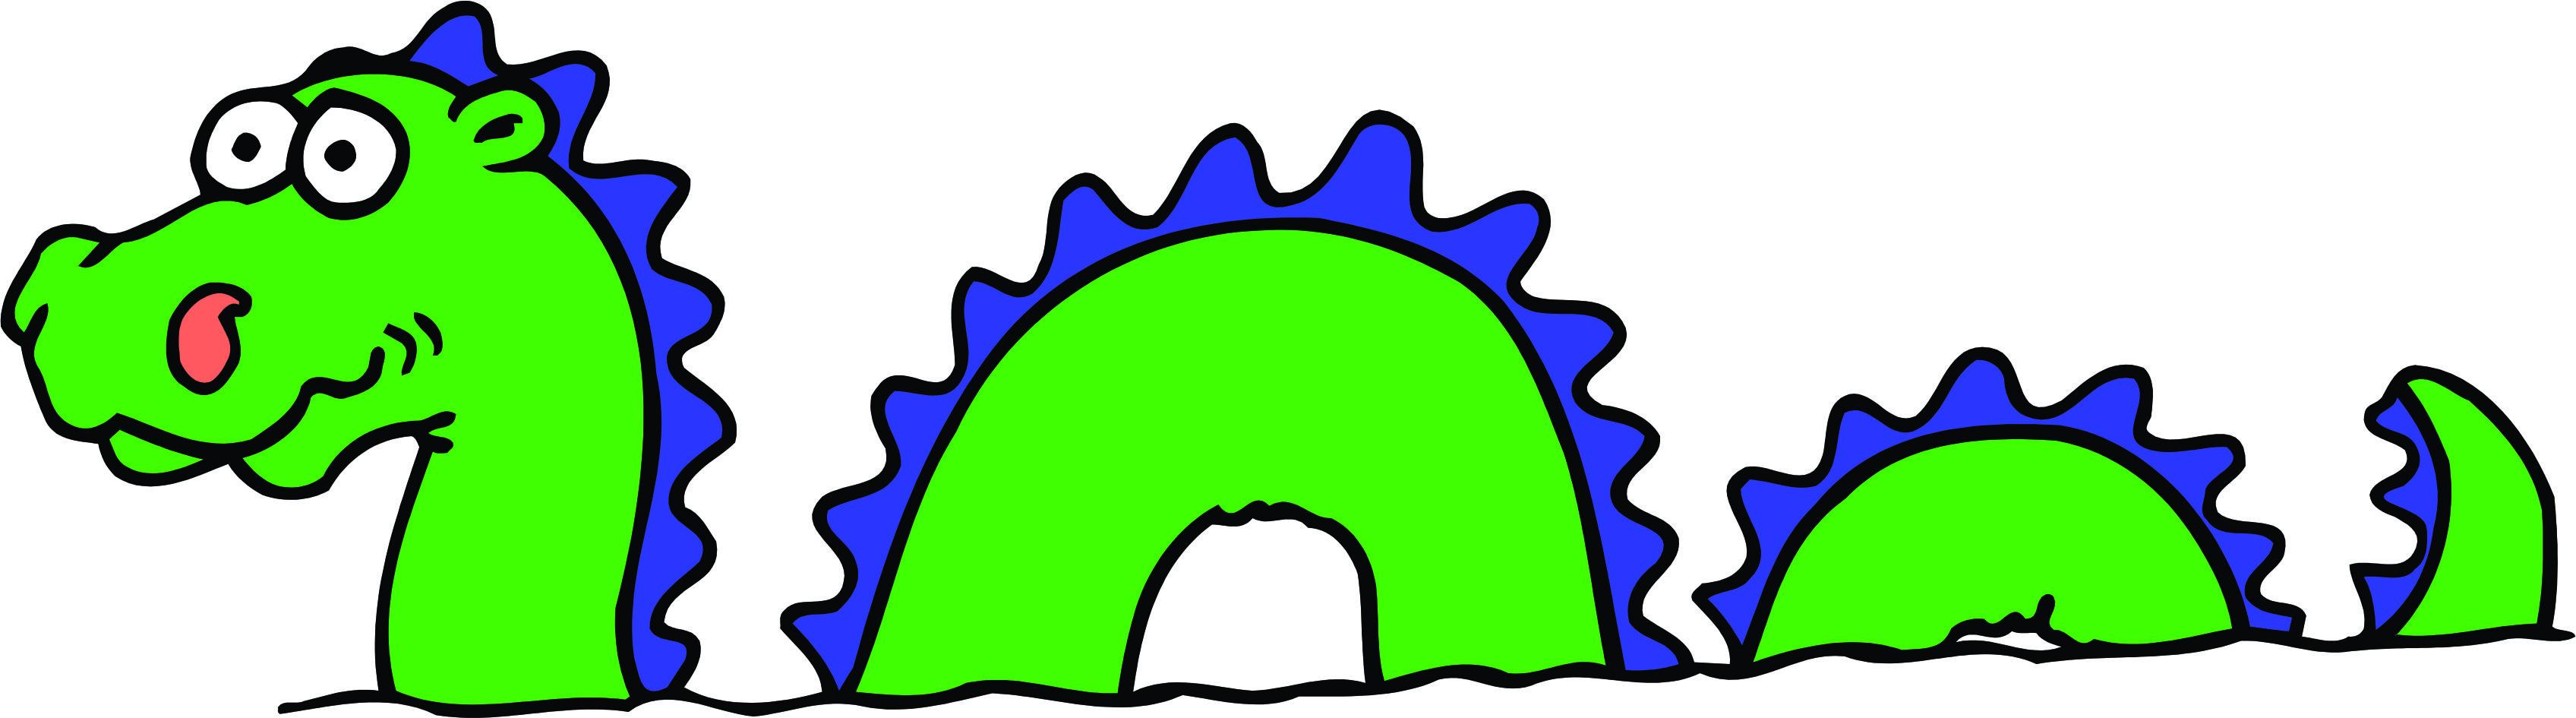 Loch ness clipart #13